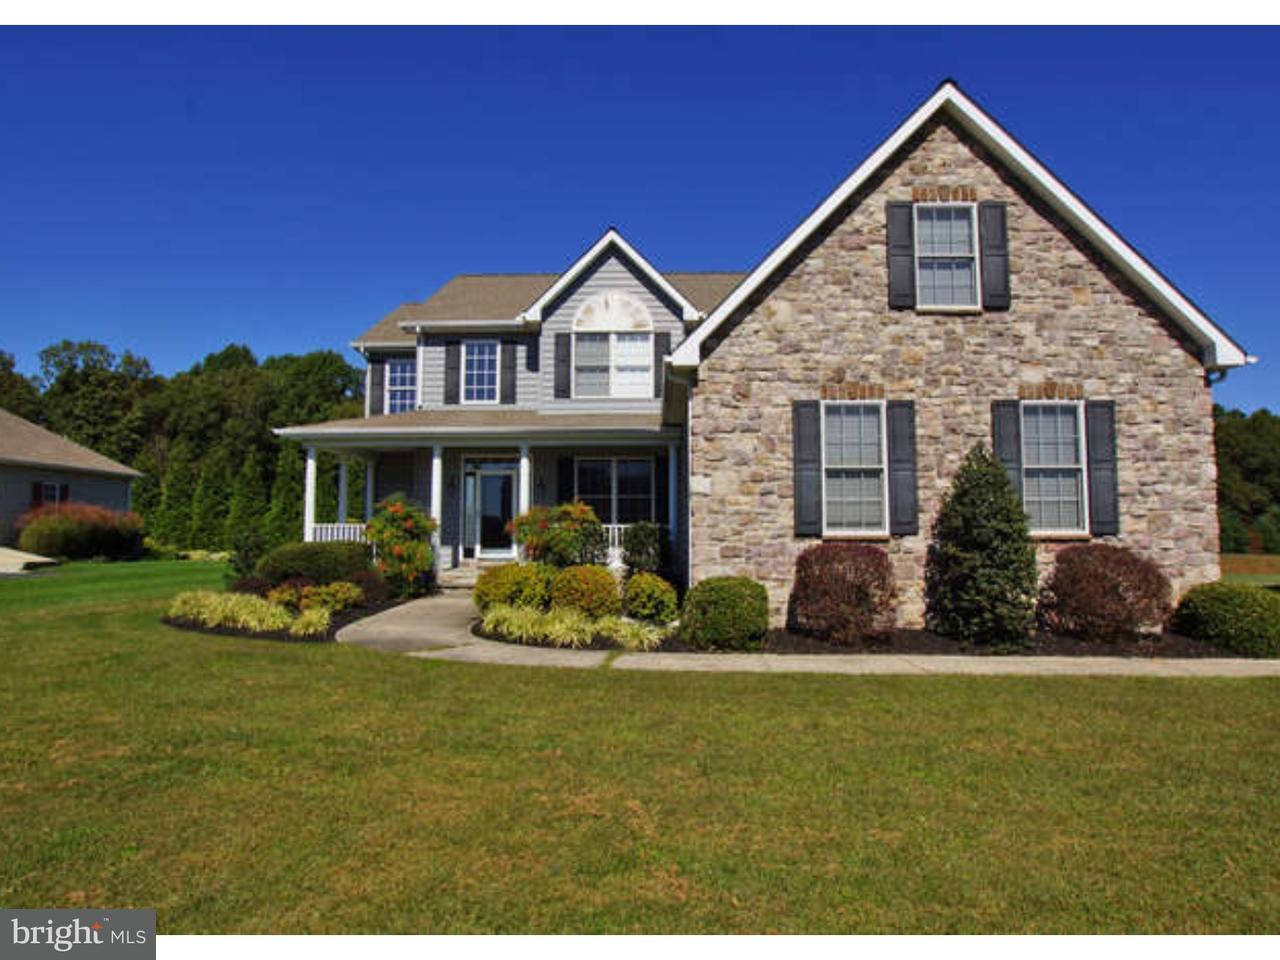 Single Family Home for Rent at 323 MERGANSER Drive Magnolia, Delaware 19962 United States